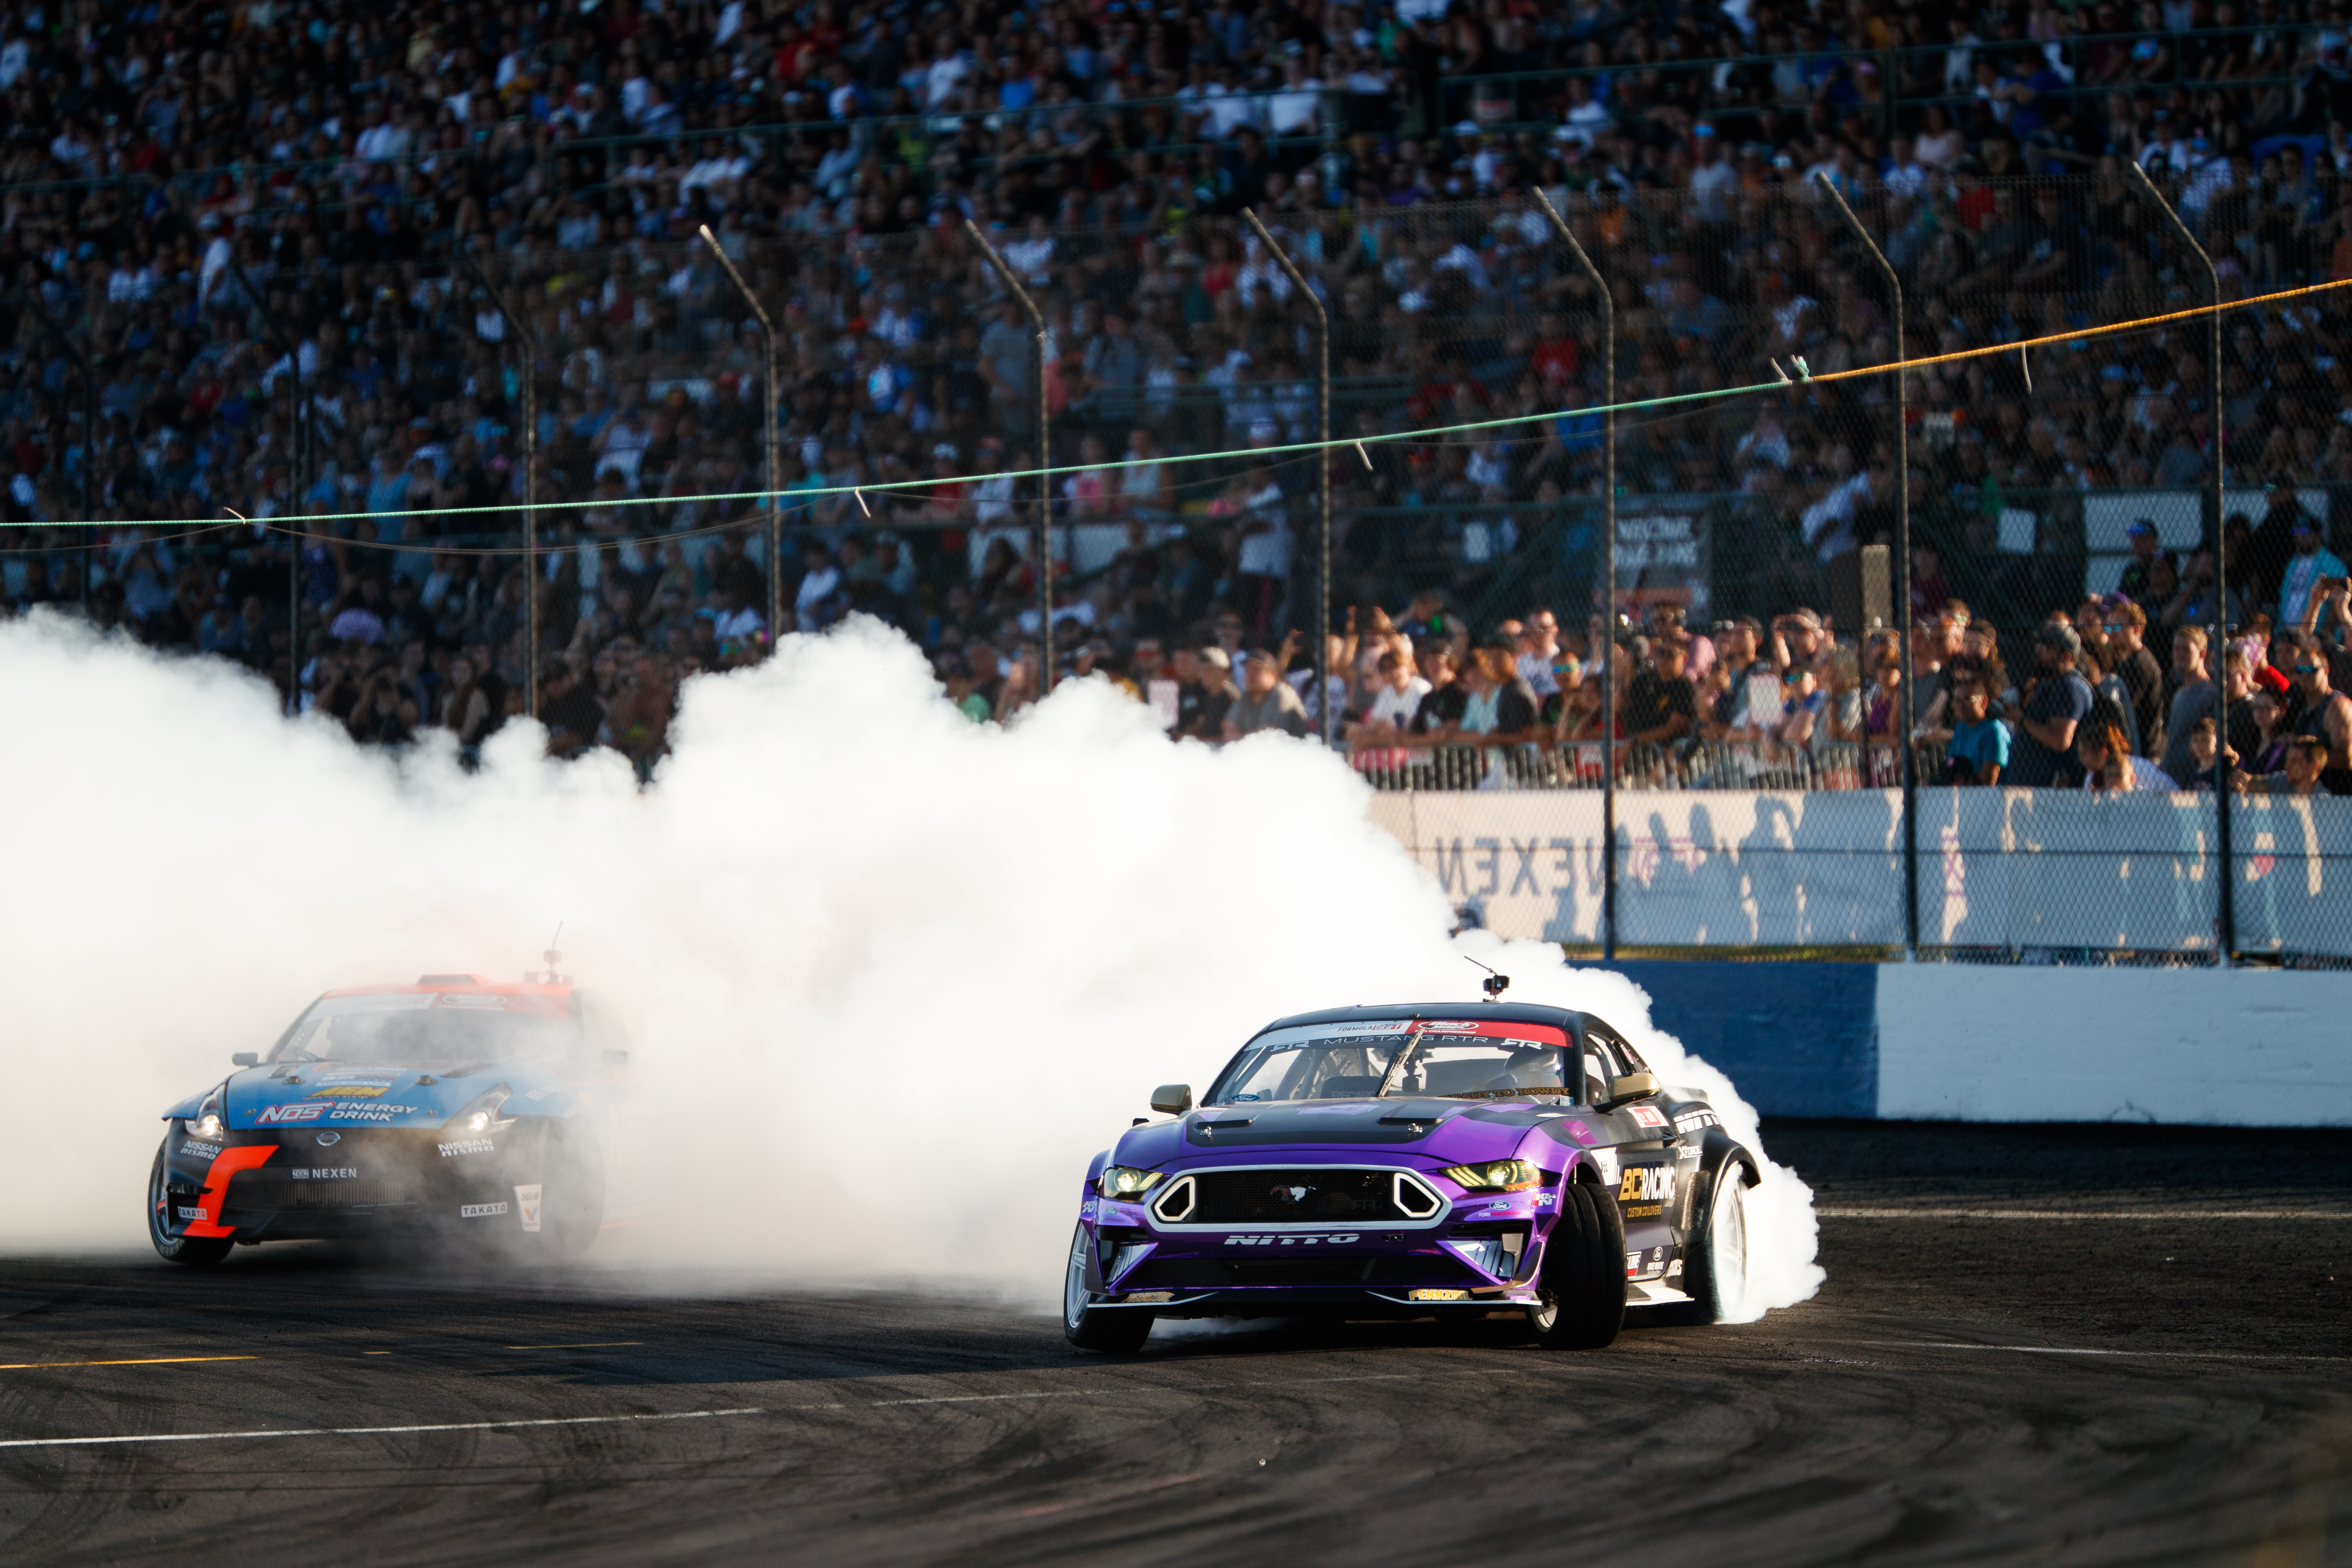 bc-racing-chelsea-denofa-gallery_5814